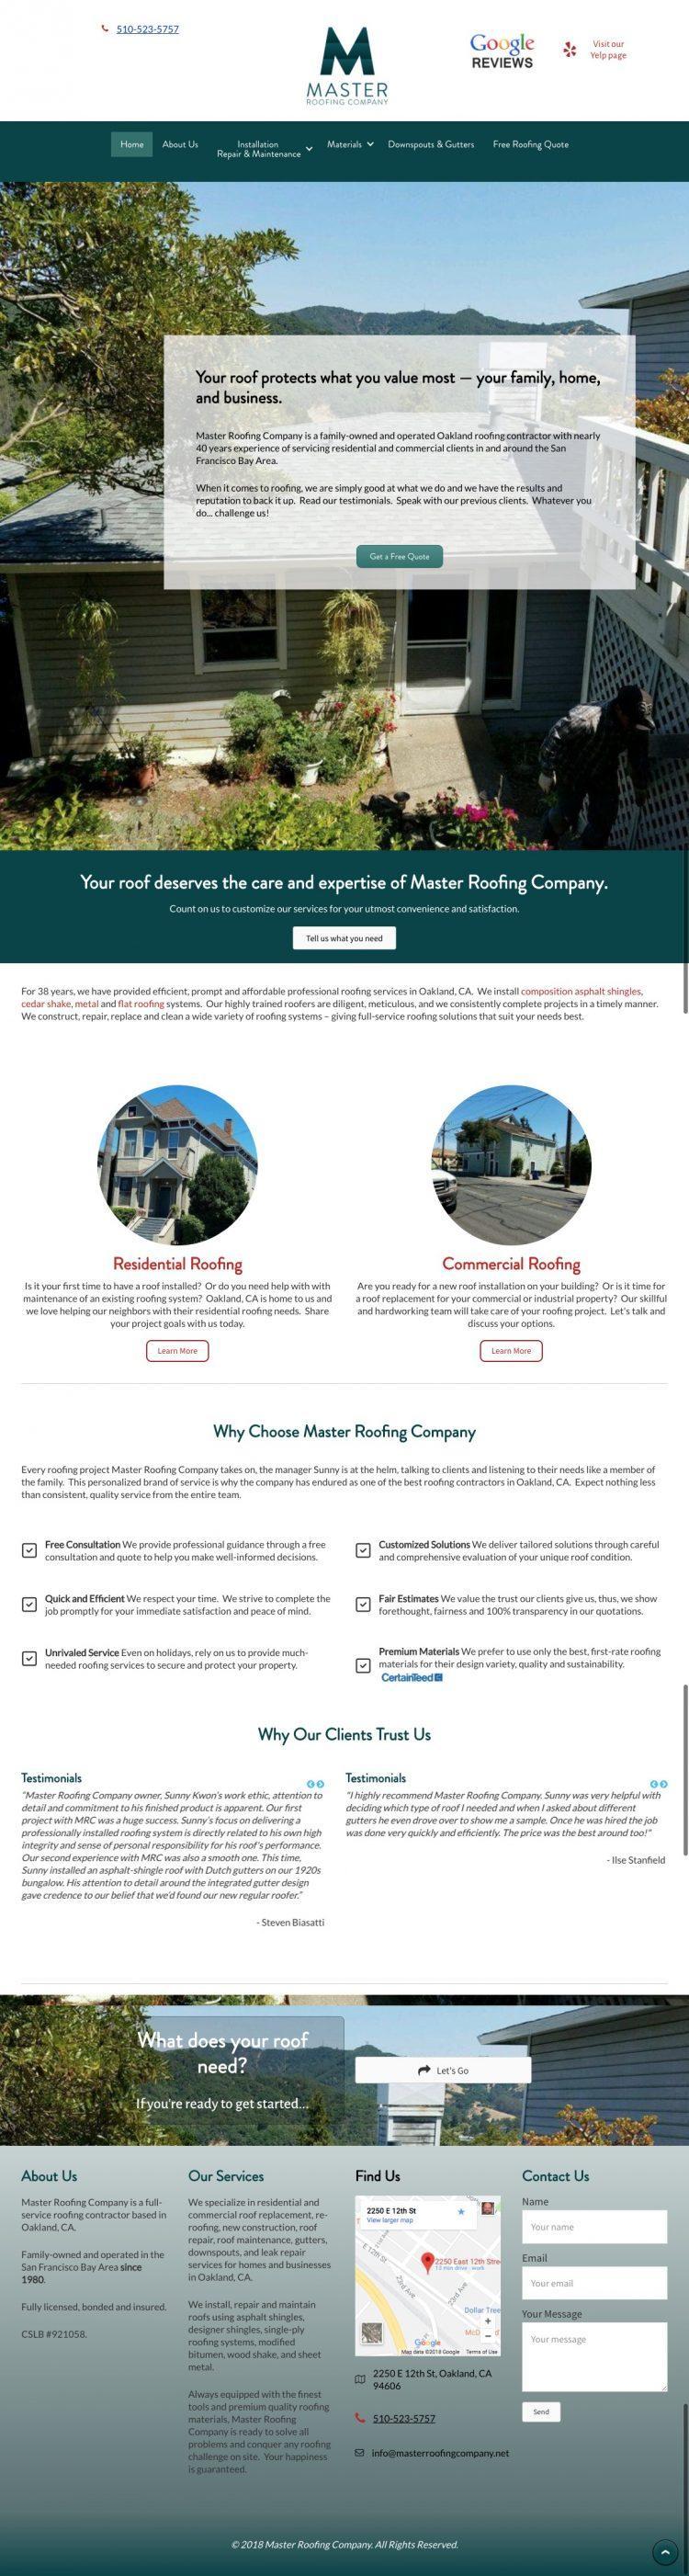 Master Roofing Company homepage screenshot